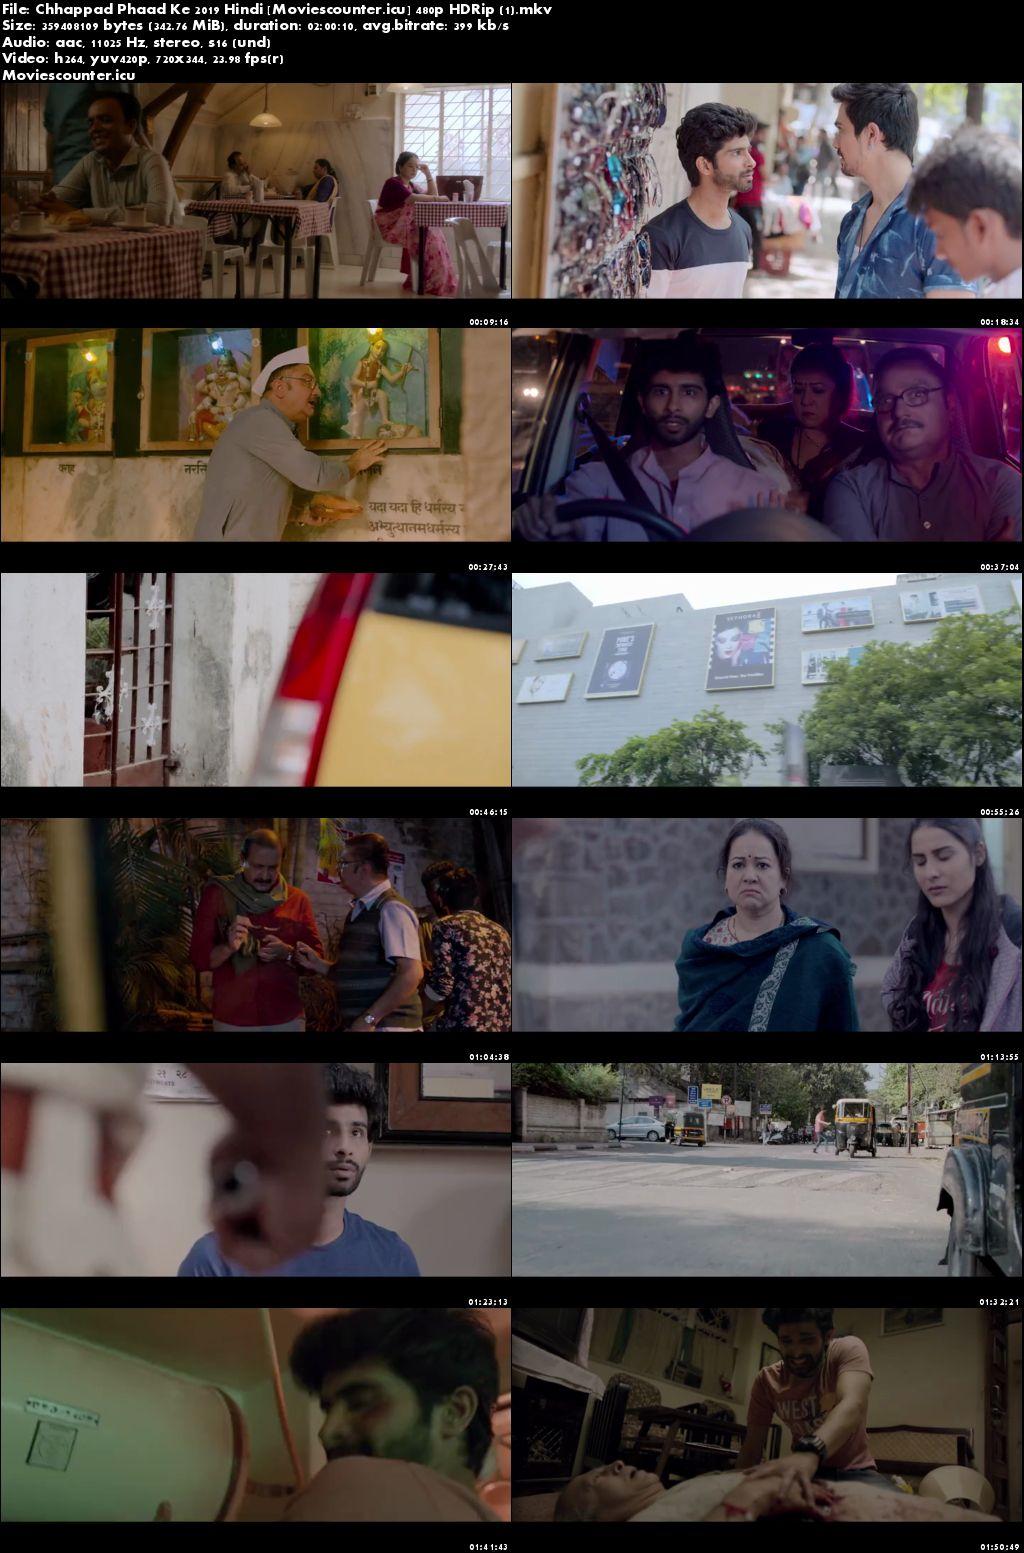 Screen Shots Chhappad Phaad Ke 2019 Hindi HD 720p